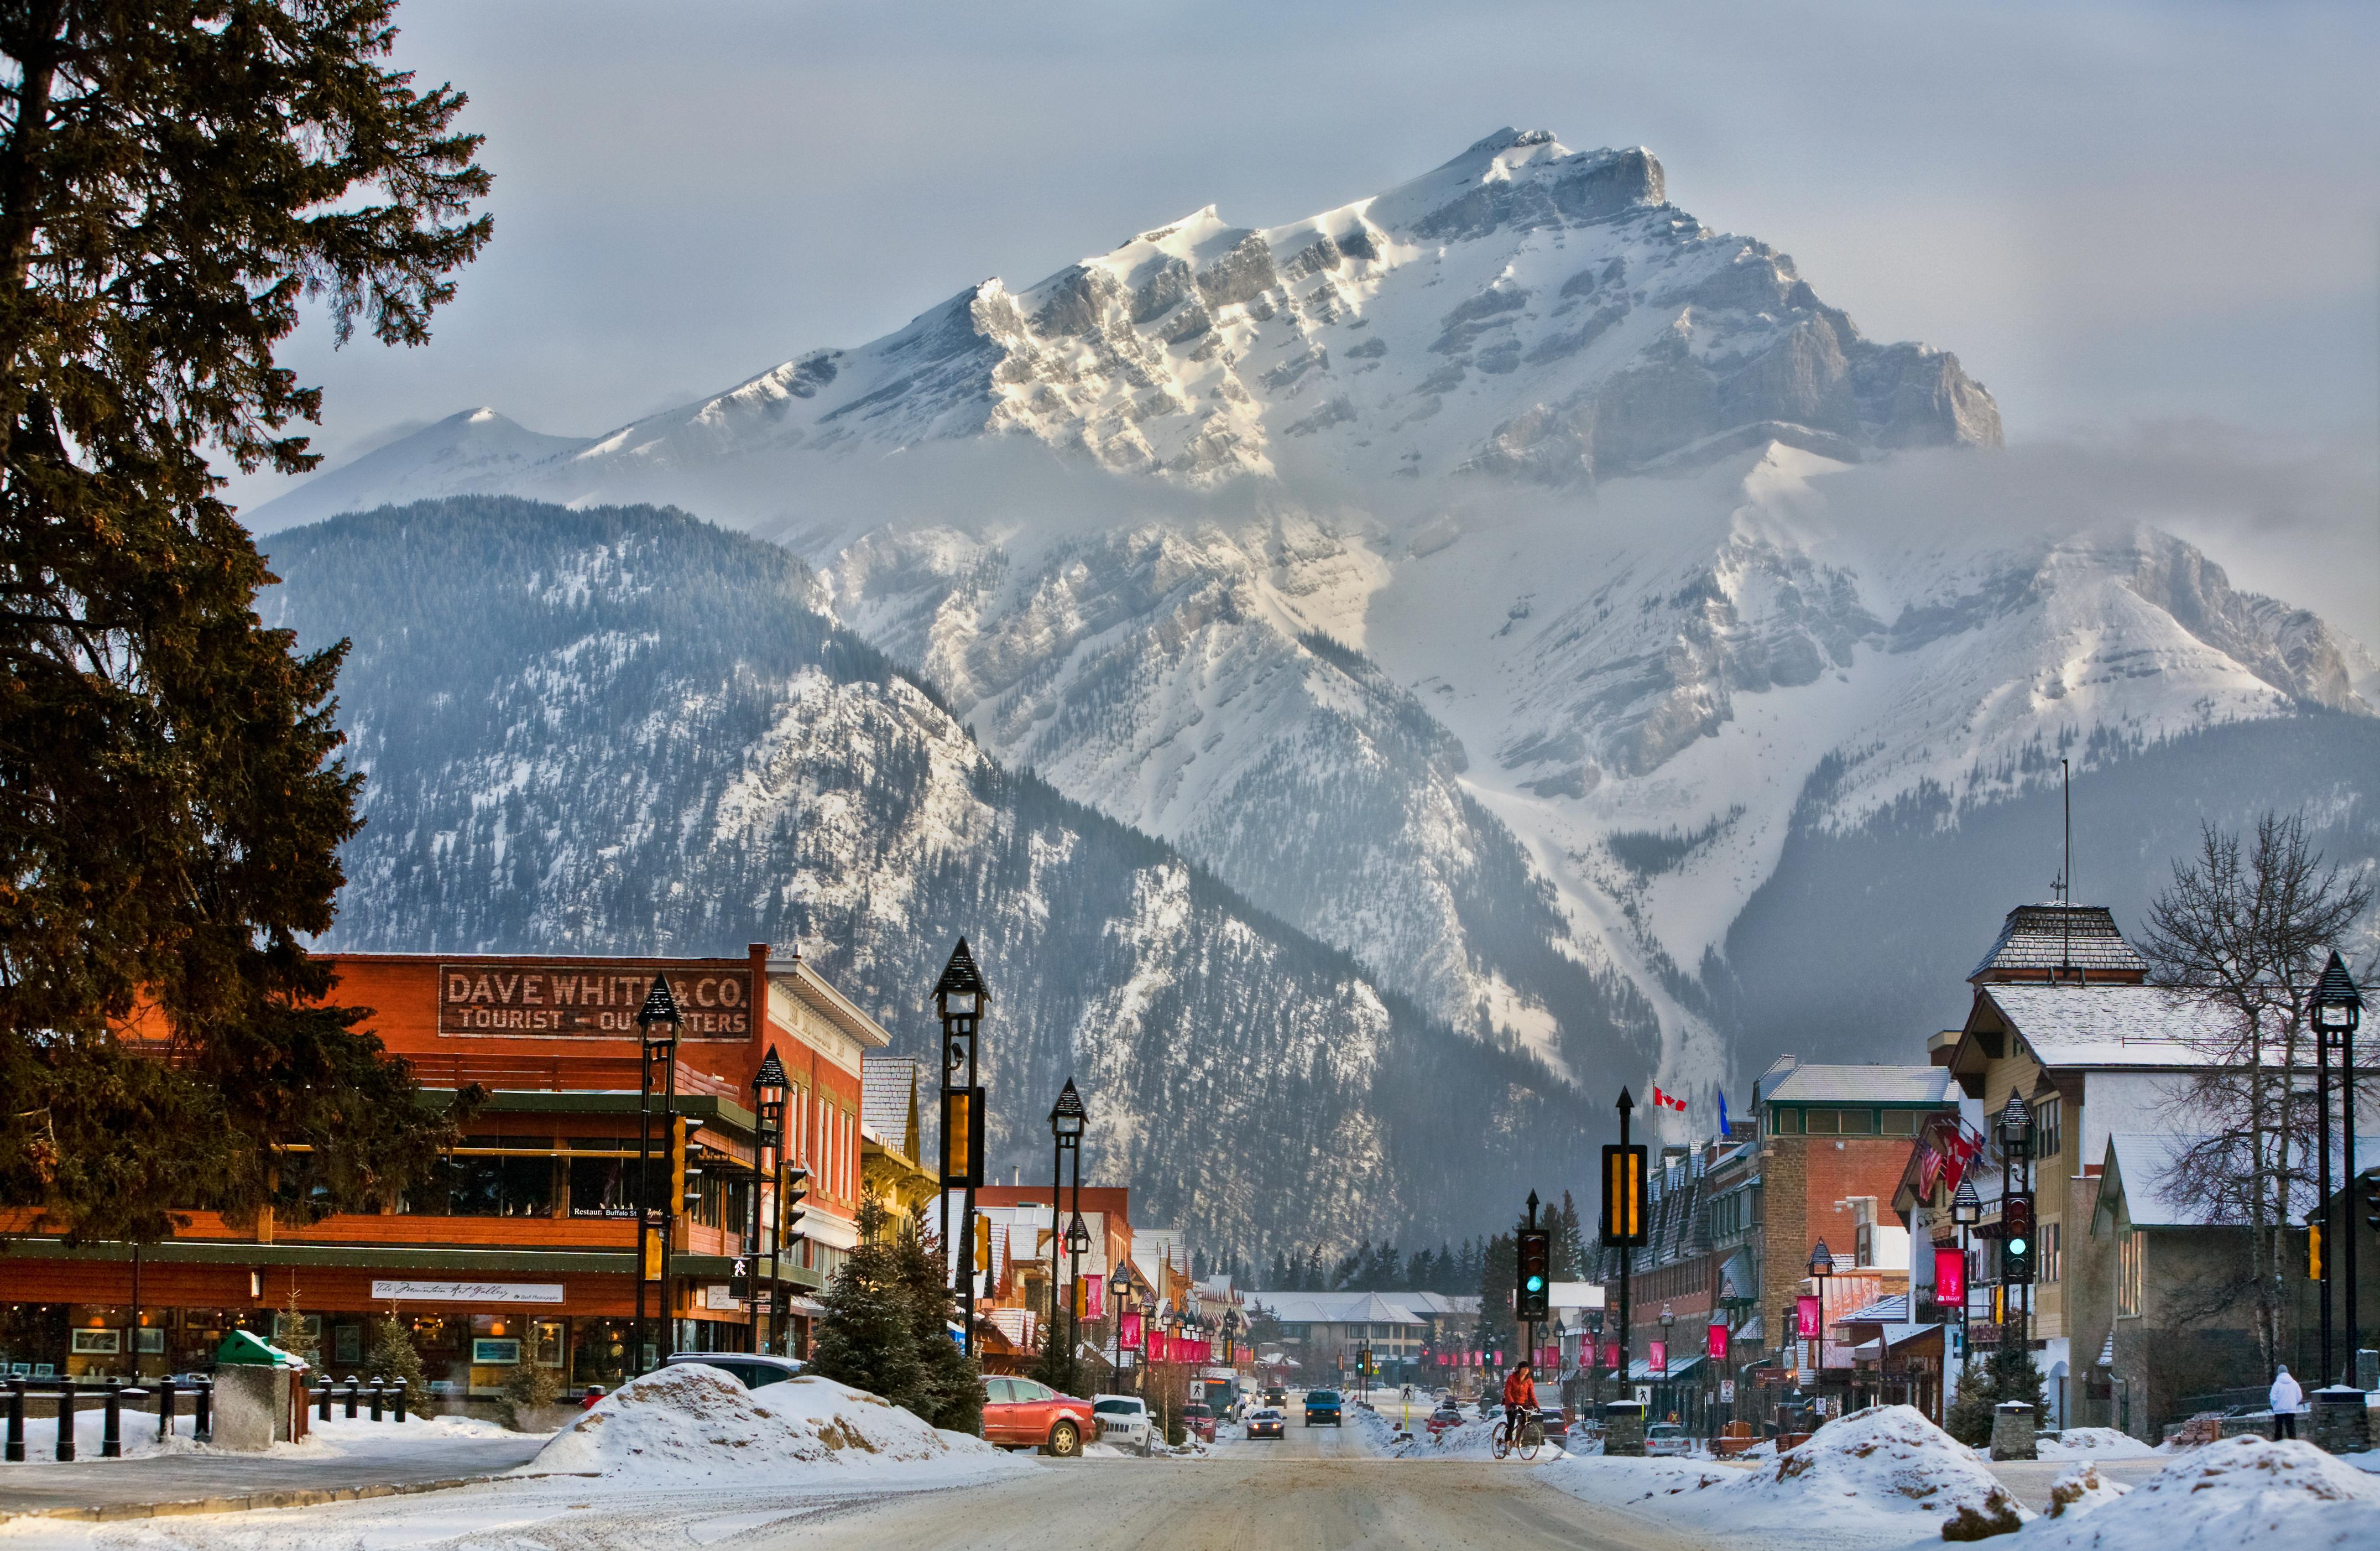 The city of Banff with its mountain backdrop. (Photo: Banff Lake Louise Tourism / Paul Zizka Photography)